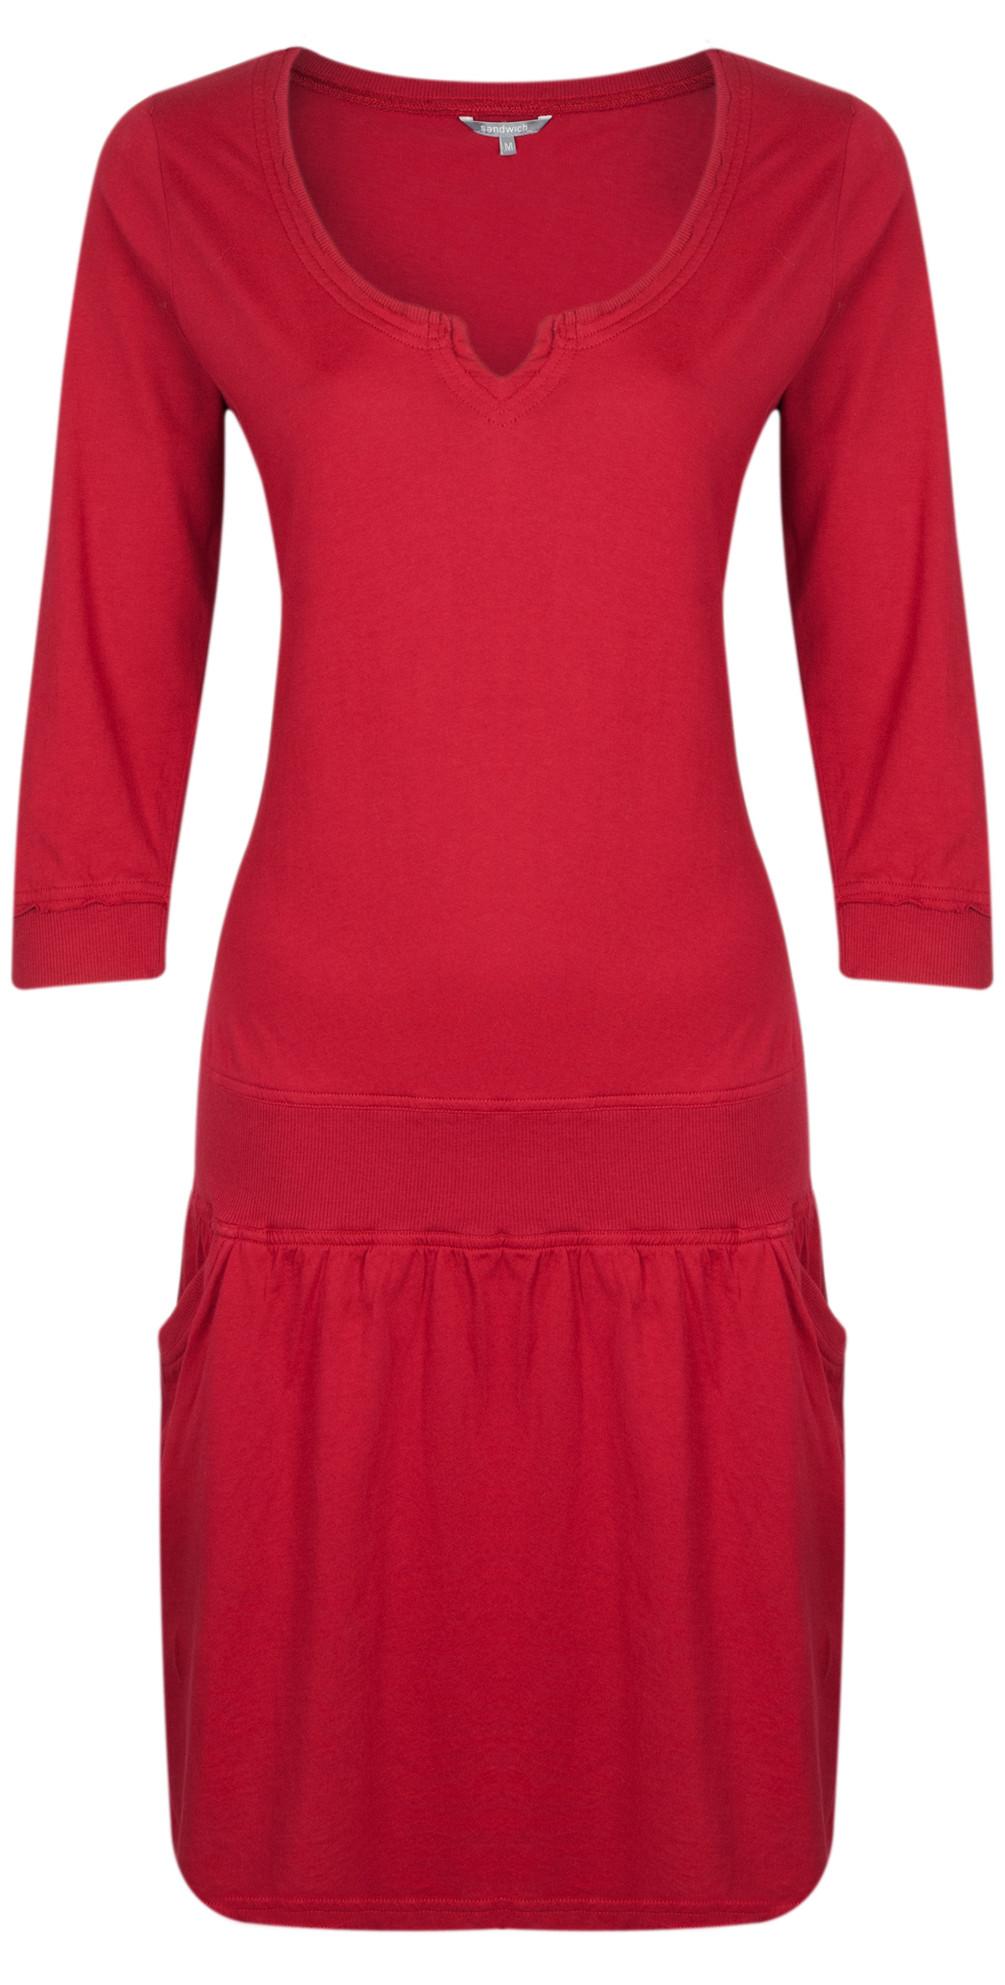 sandwich clothing single jersey dress in winterred. Black Bedroom Furniture Sets. Home Design Ideas